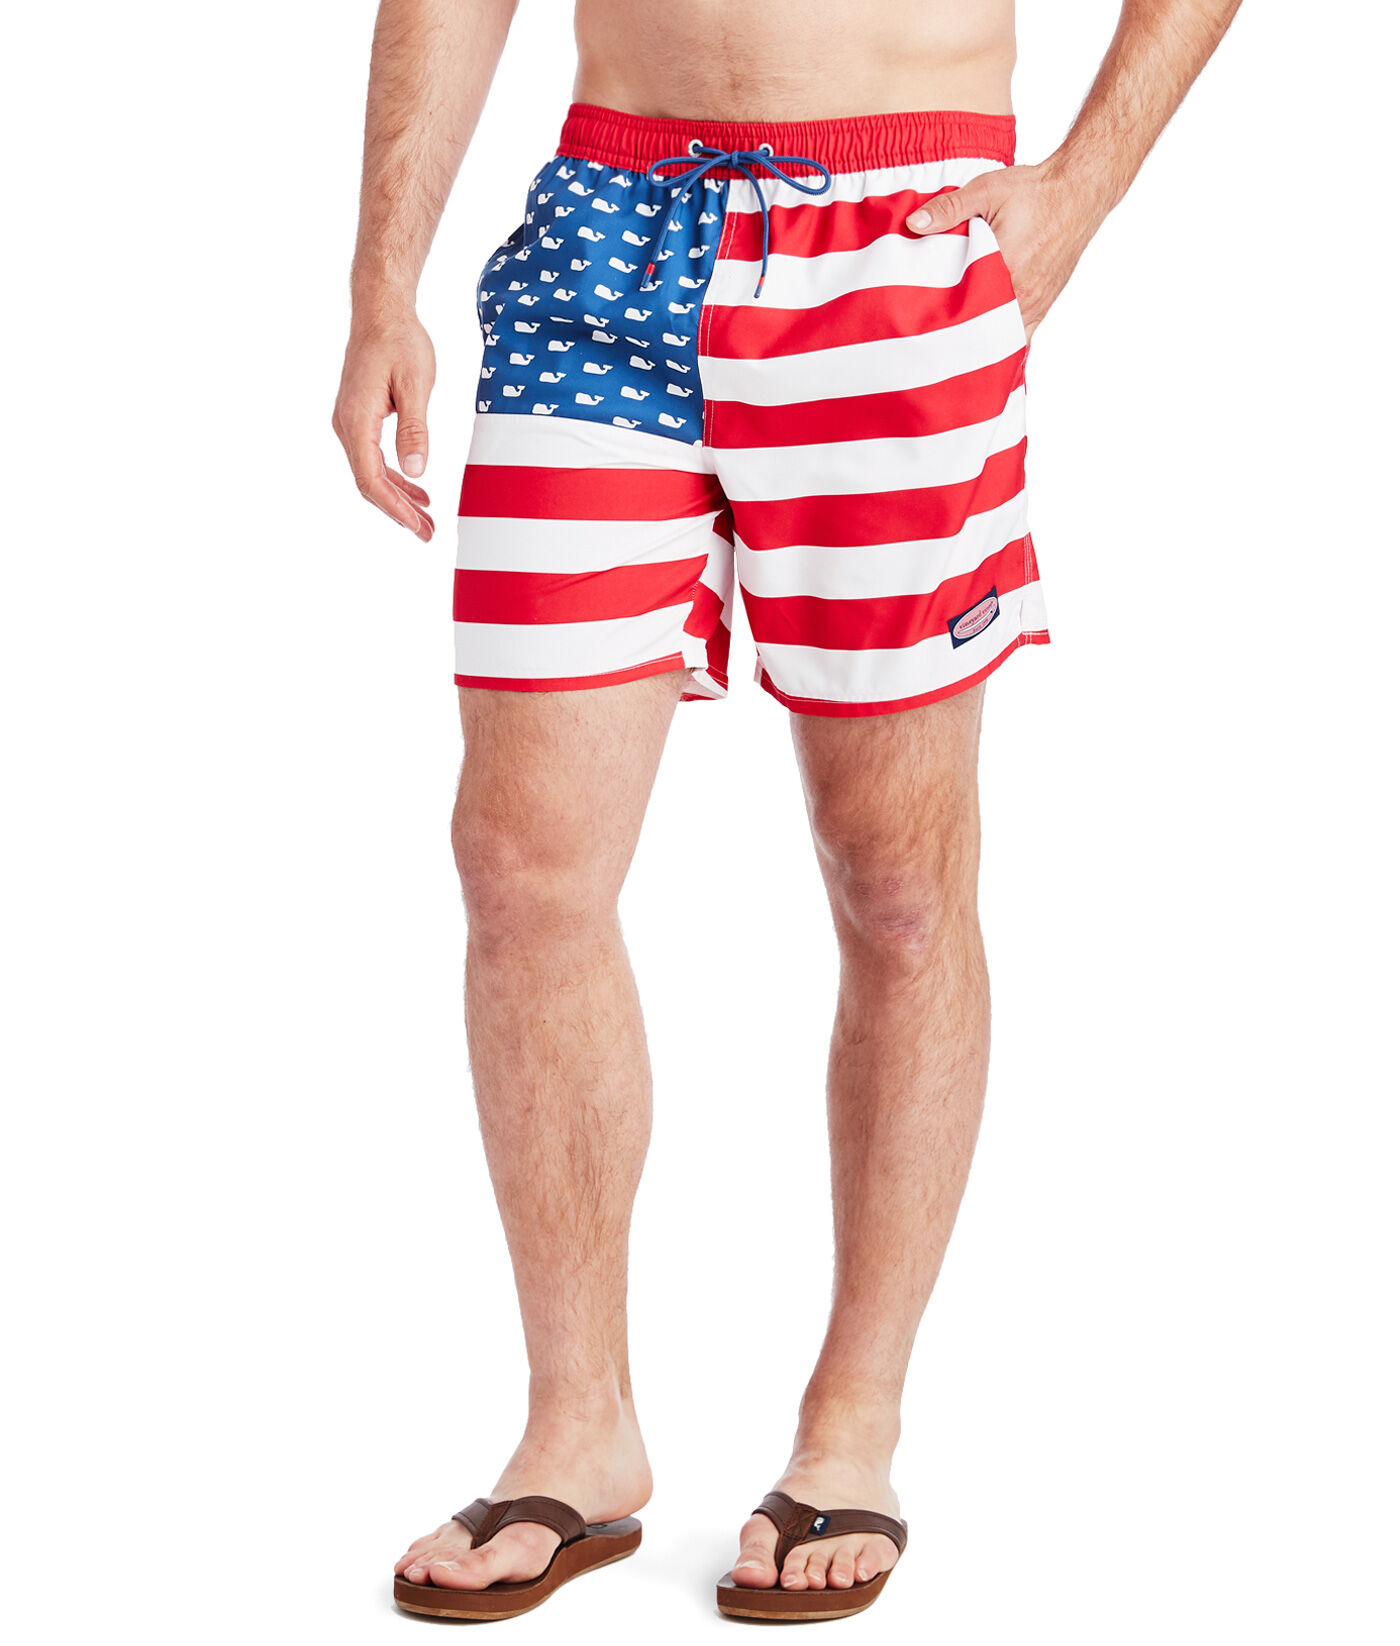 Love Needs Mens Swim Trunks American Flag Blue Red Star Stripe Drawstring Boardshorts